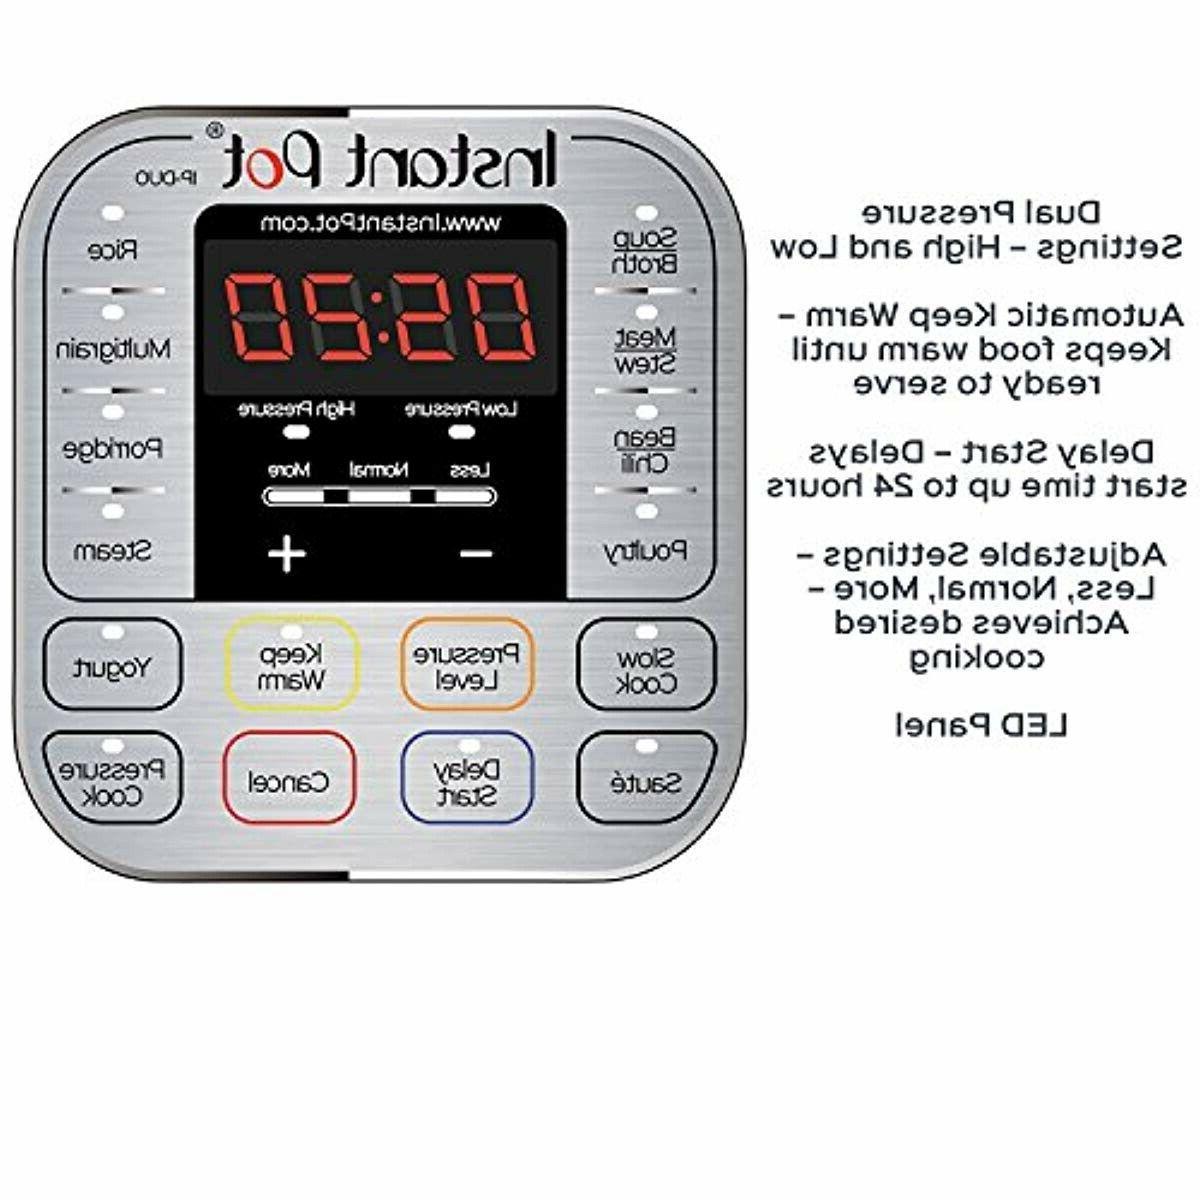 Instant Pot 3-8 Qt 7-in-1 Programmable